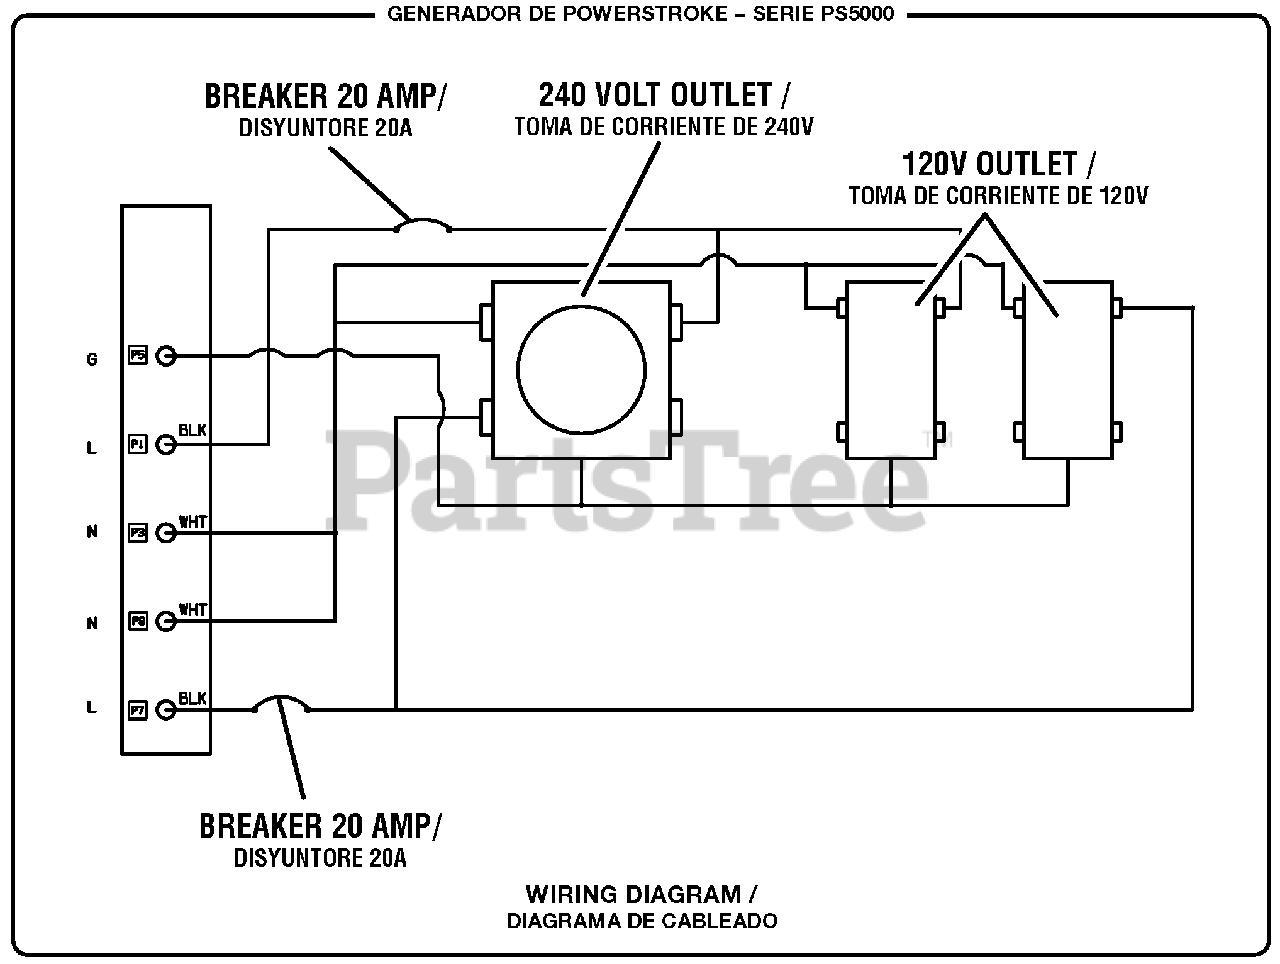 20 amp outlet diagram powerstroke ps 5000 powerstroke 5 000 watt generator wiring  powerstroke 5 000 watt generator wiring